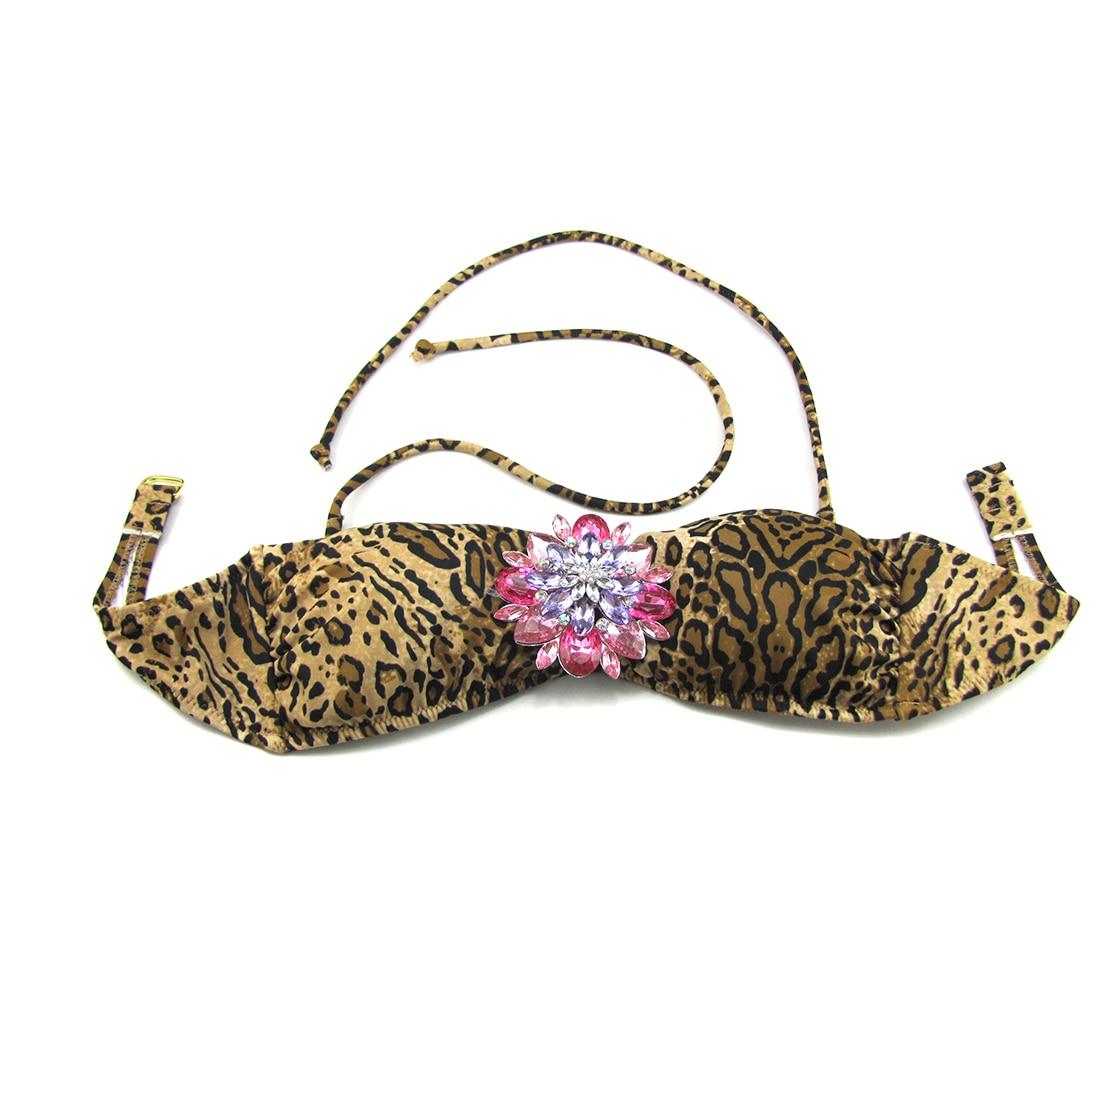 Mixer Bikini TOPS for Women Swimwear Top Designer For Secret Diamond Leopard Bathing suits Sexy swimming biquini UP 5